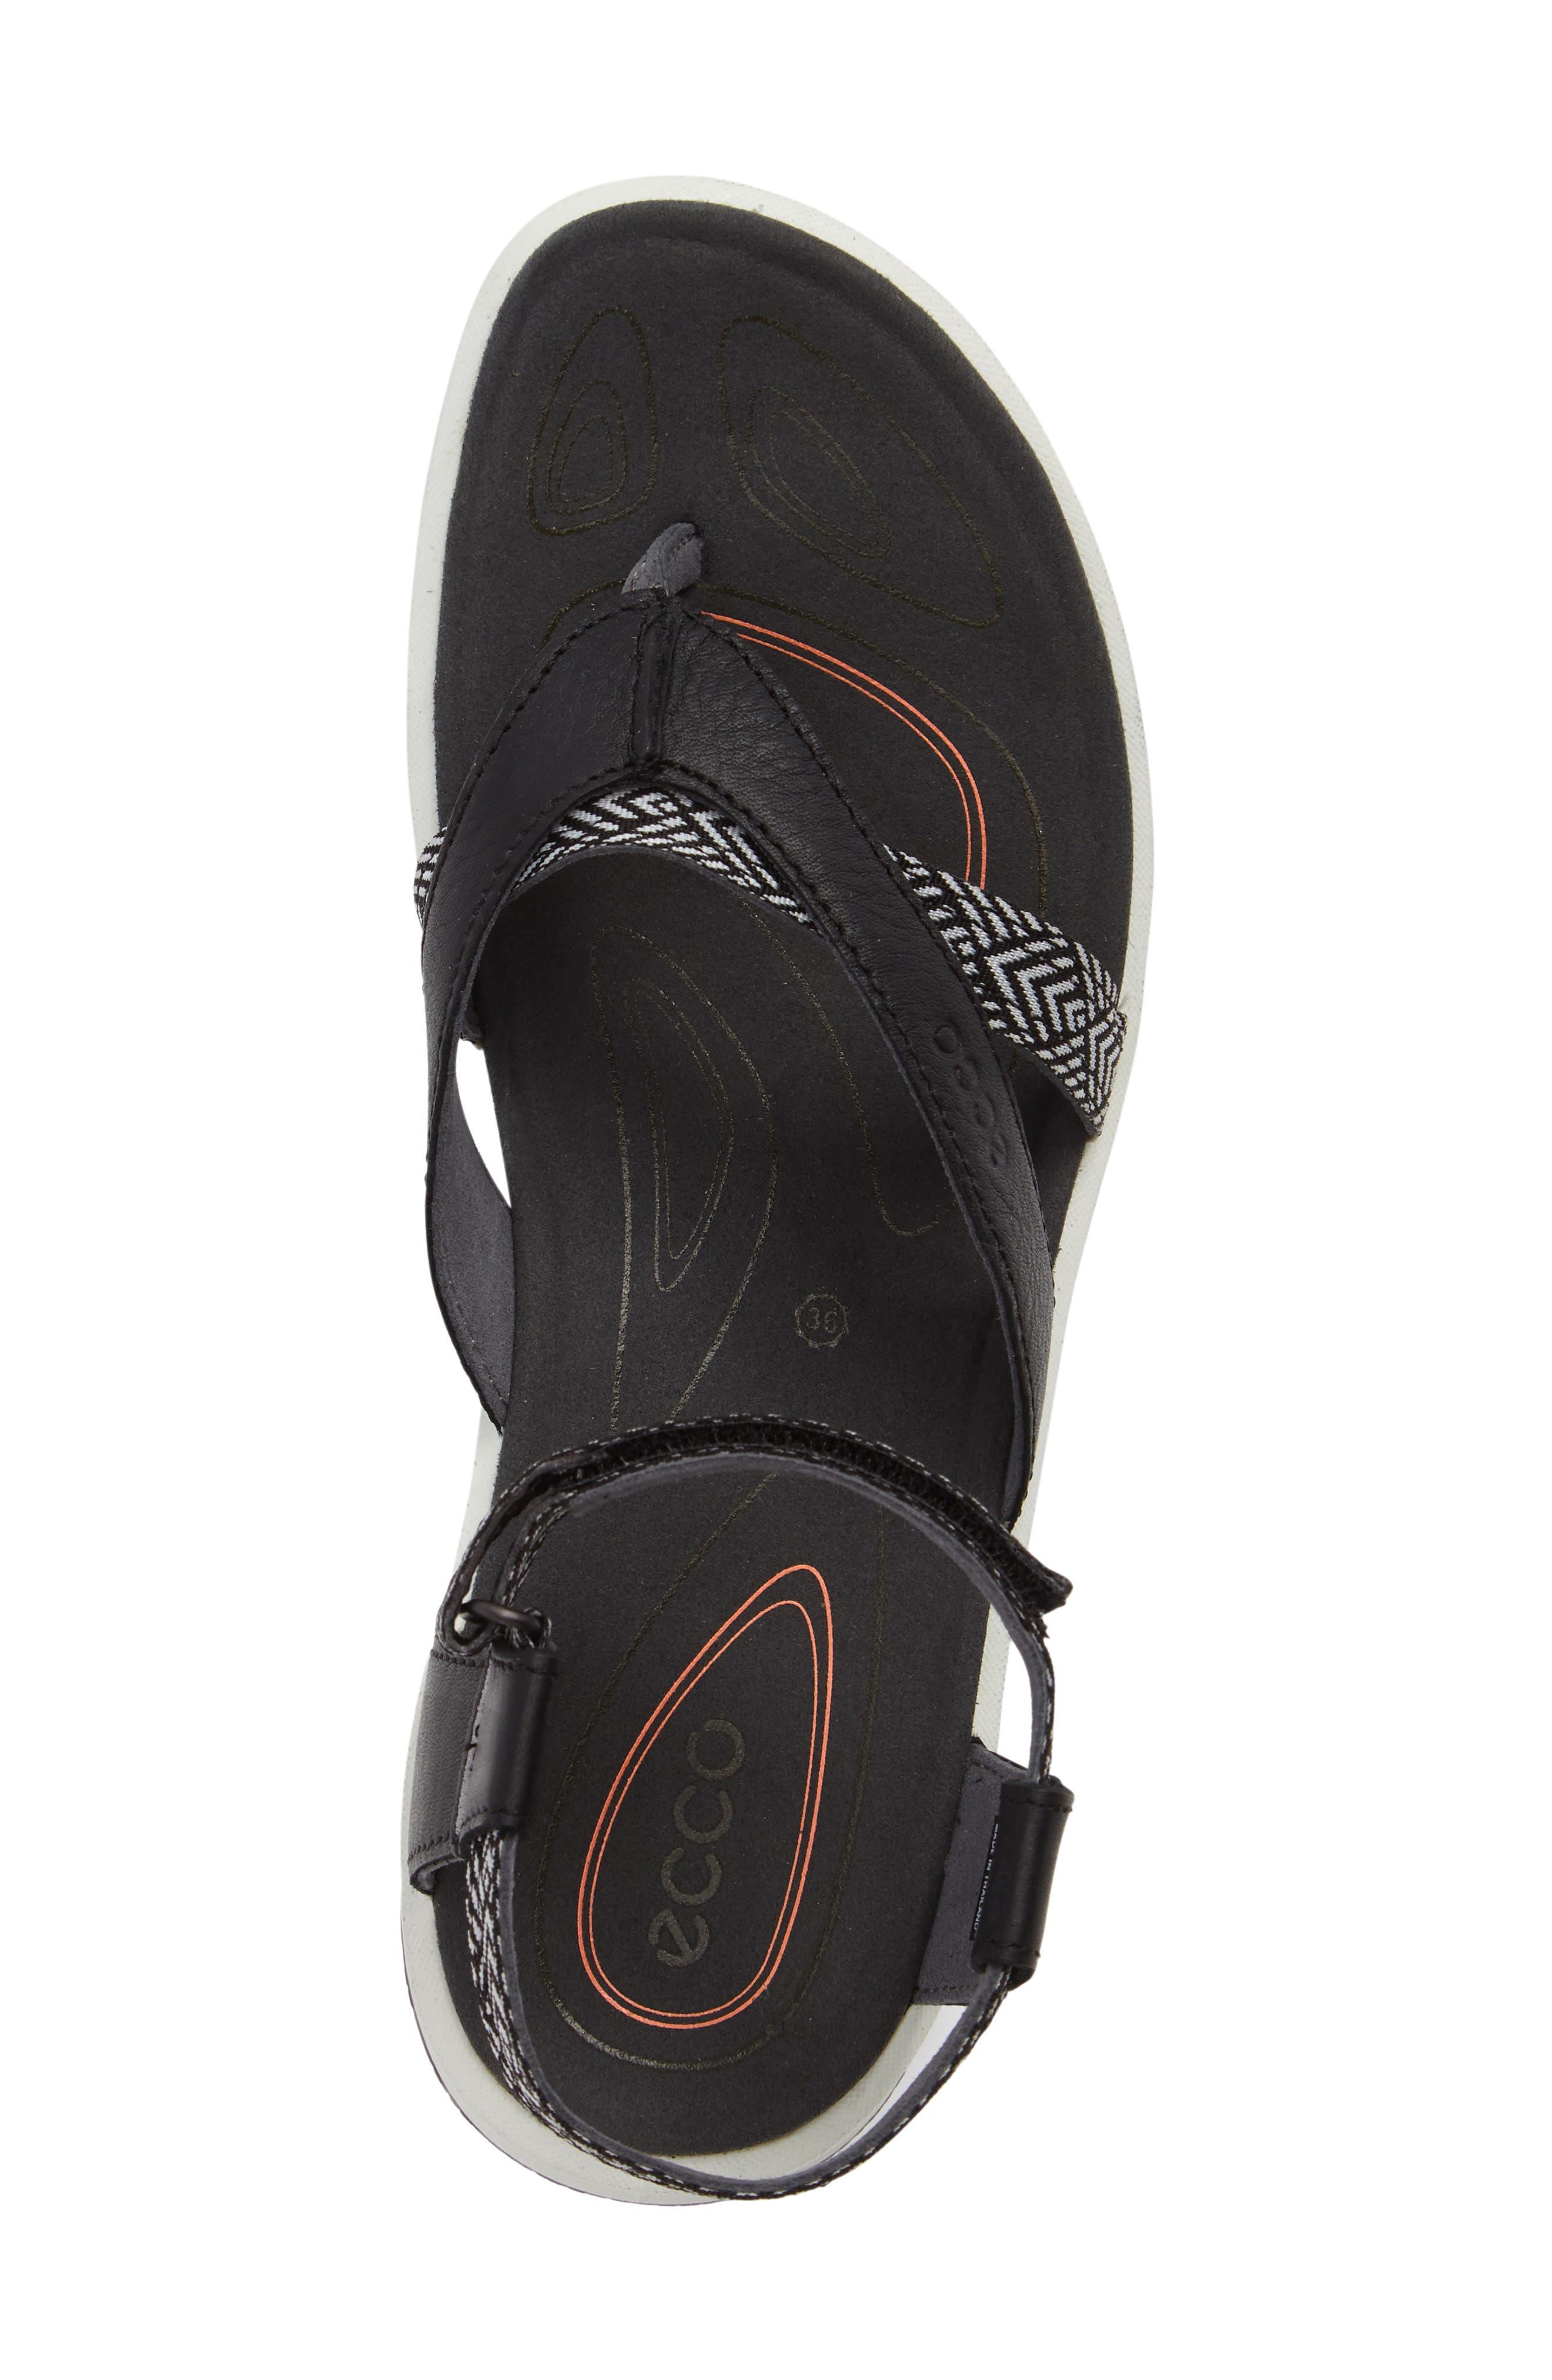 Cruise Sport Sandal,                             Alternate thumbnail 5, color,                             Black Leather